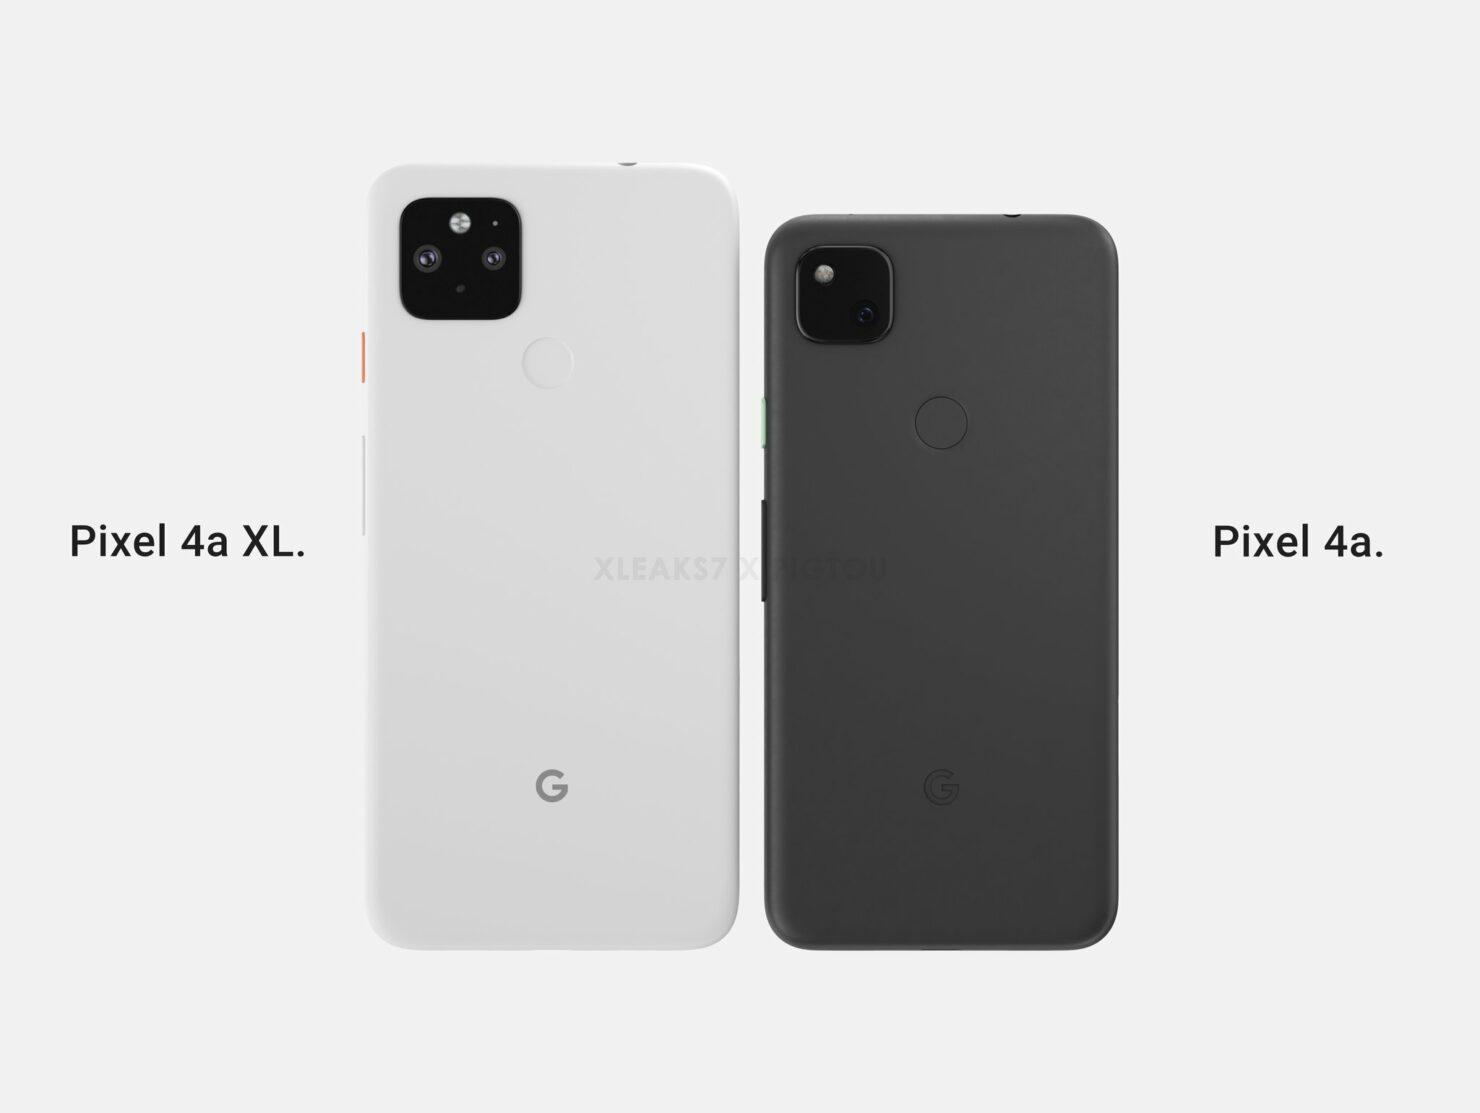 google_pixel_4a_xl_vs_pixel_4a_2048x2048